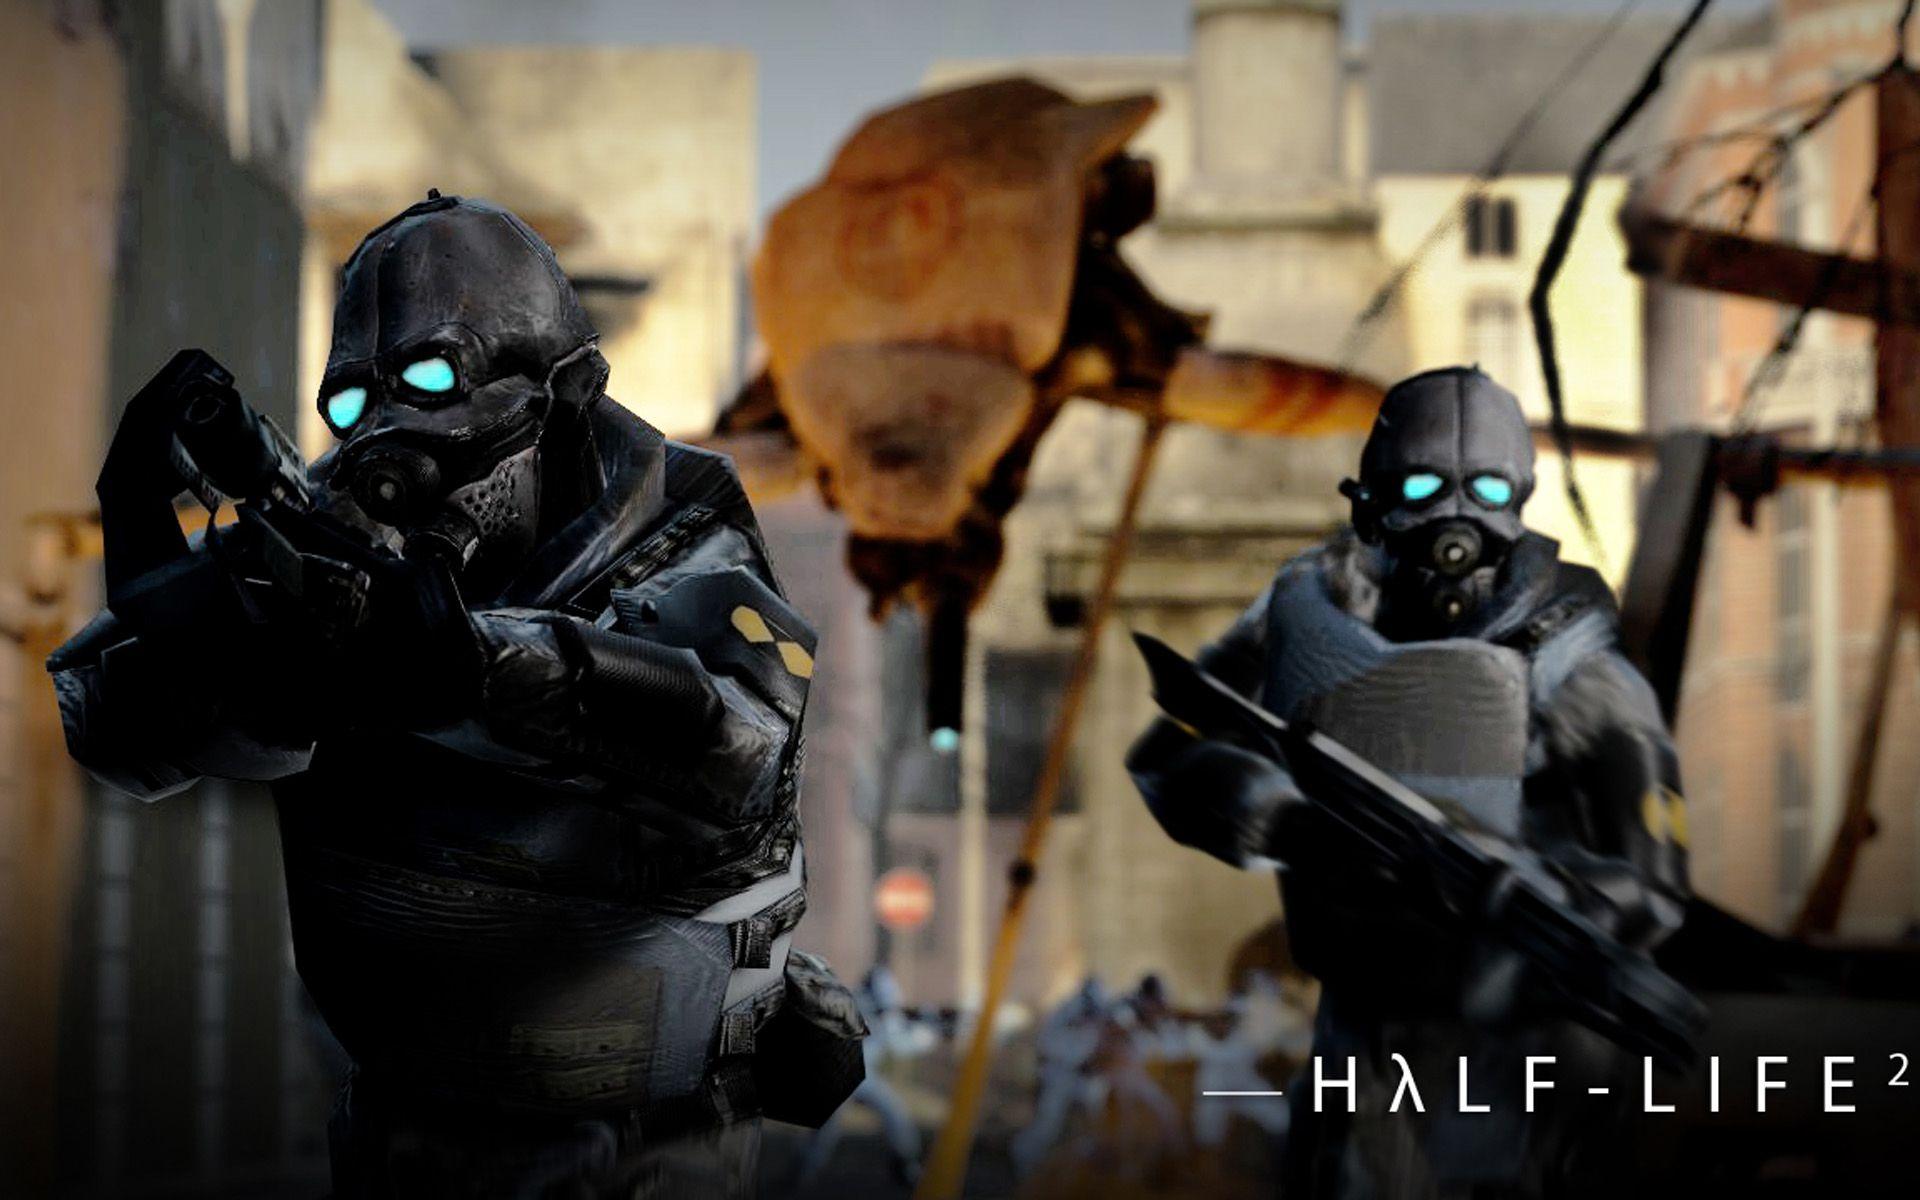 Download Half Life 2 Combine Wallpaper Gallery Half Life Life Half